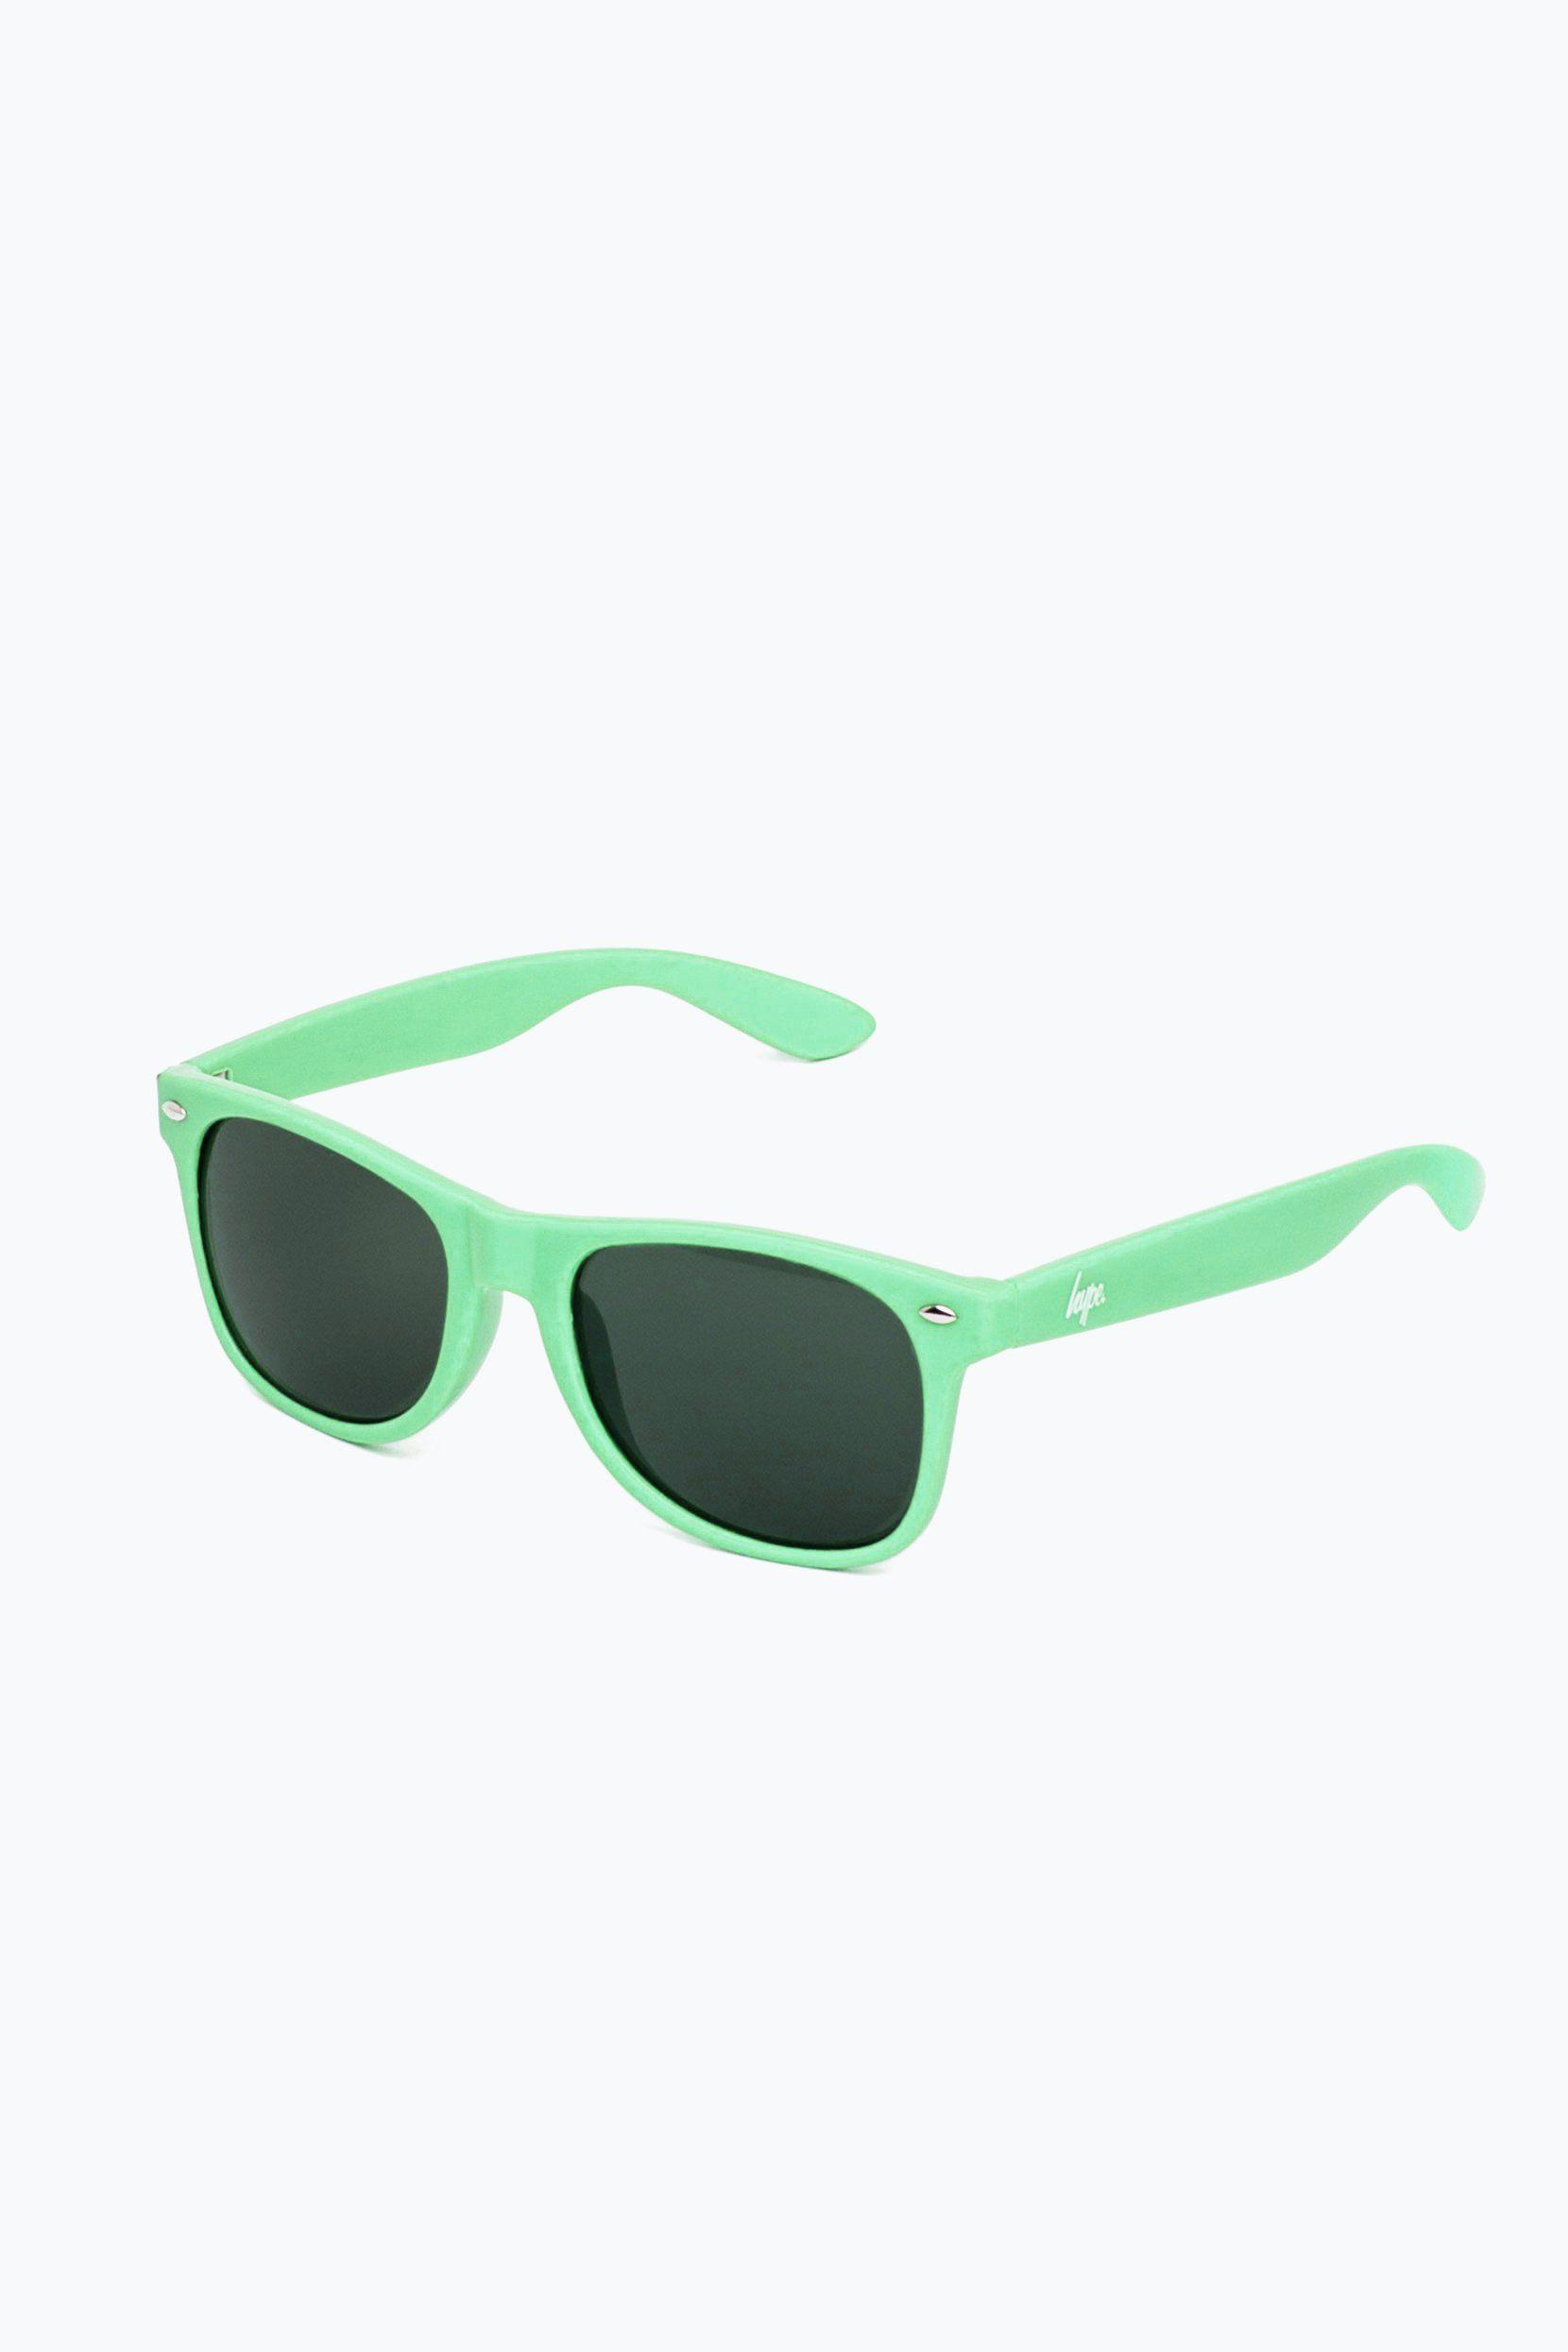 Hype Mint Pastel Sunglasses